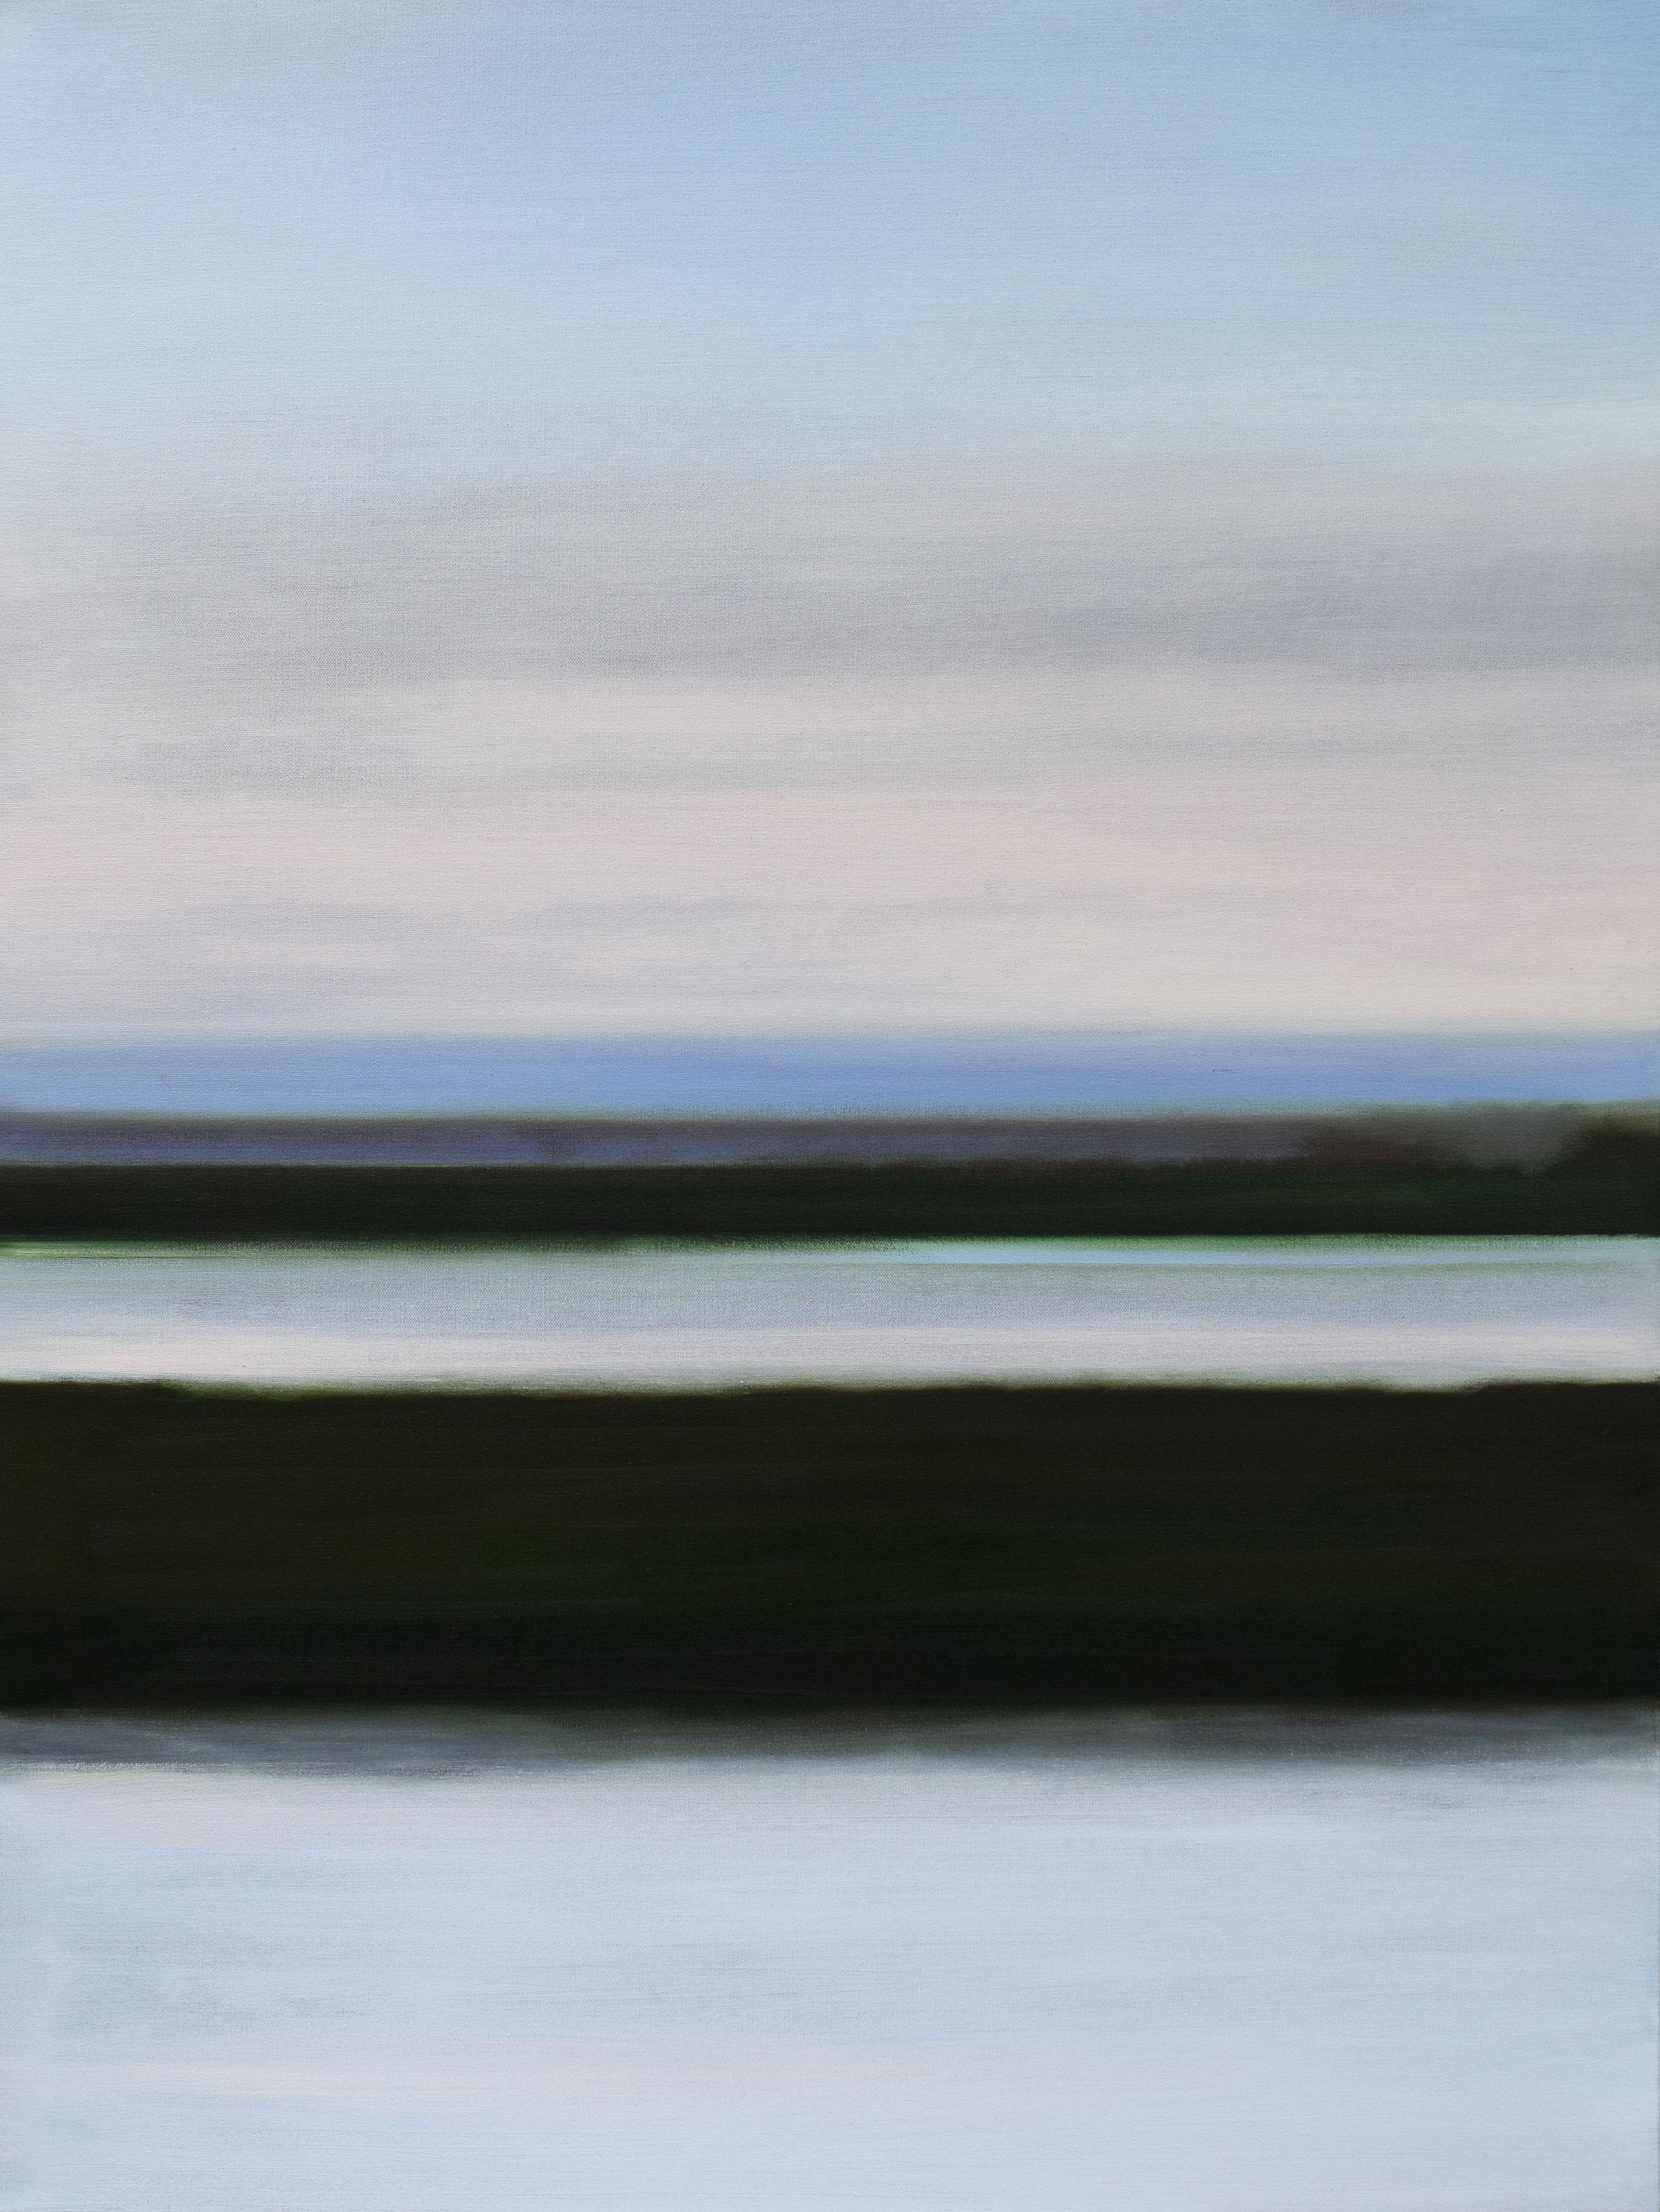 Essex Marshes Horizon I